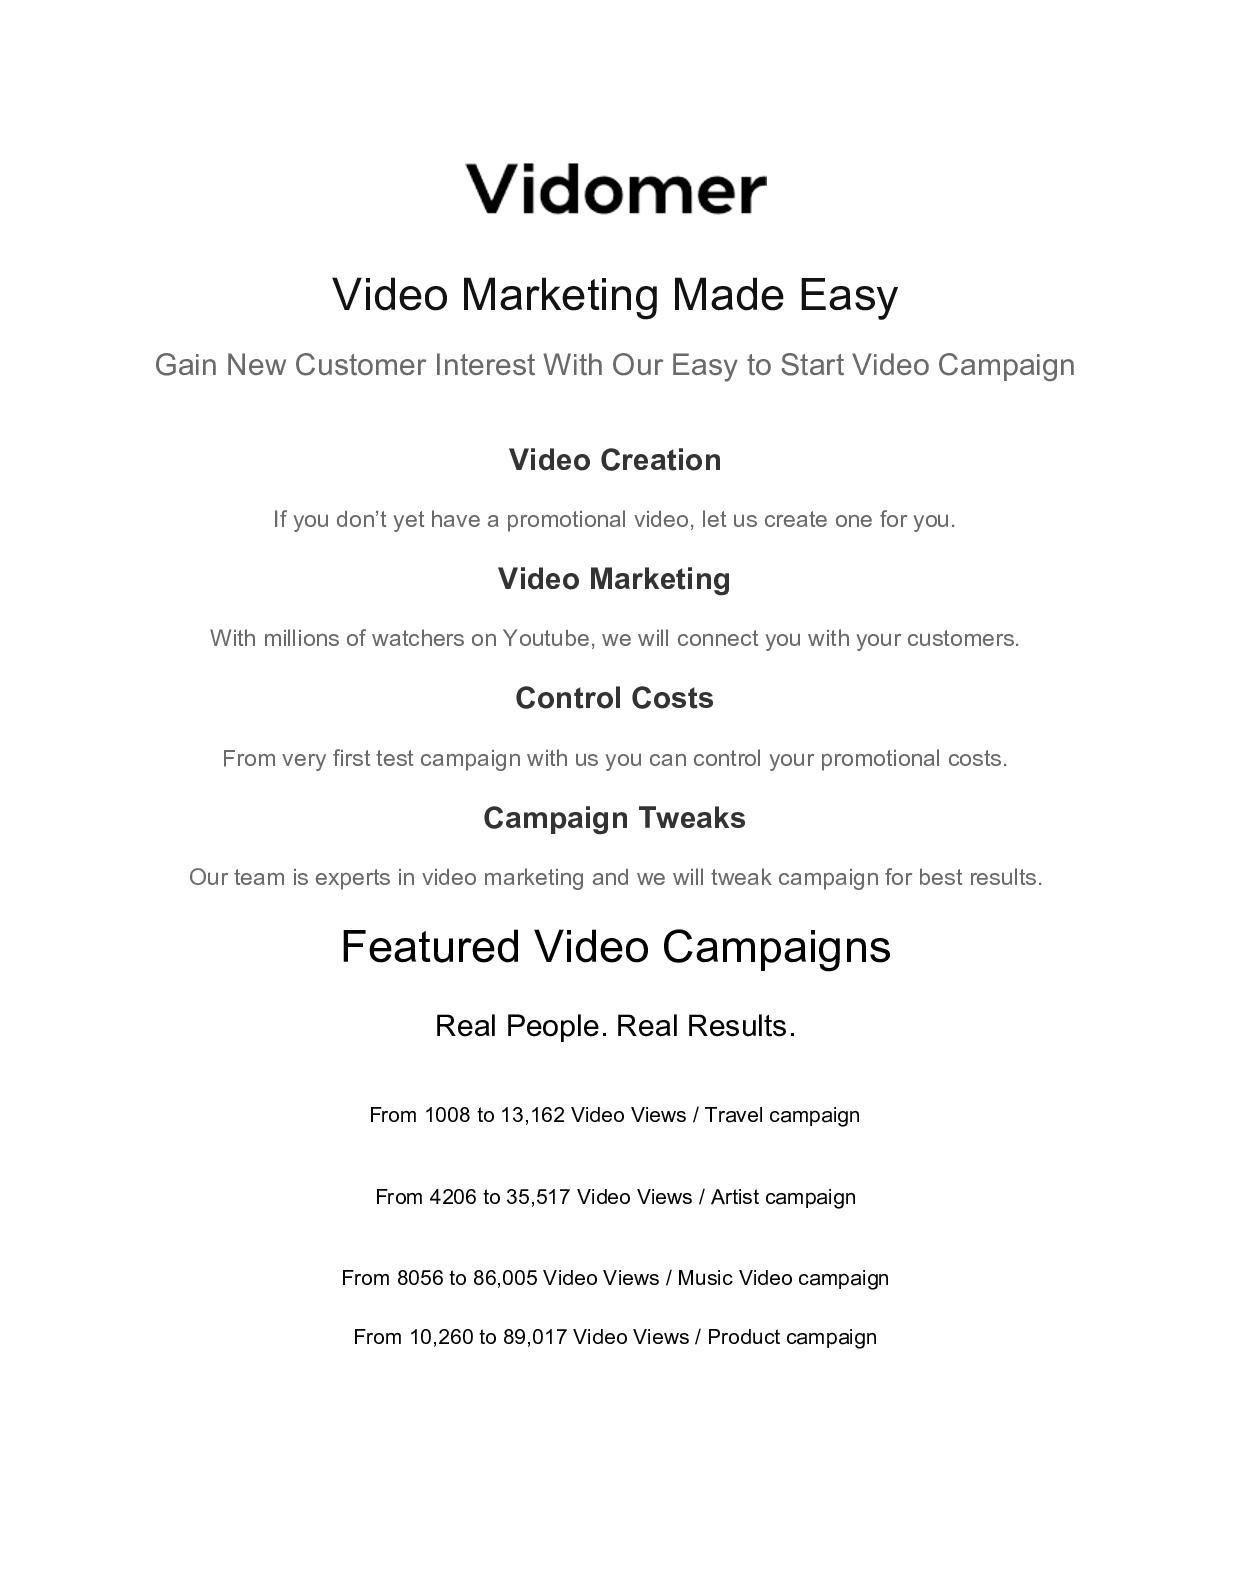 Calaméo - Using Vidomer com Youtube Promotion Video Strategy